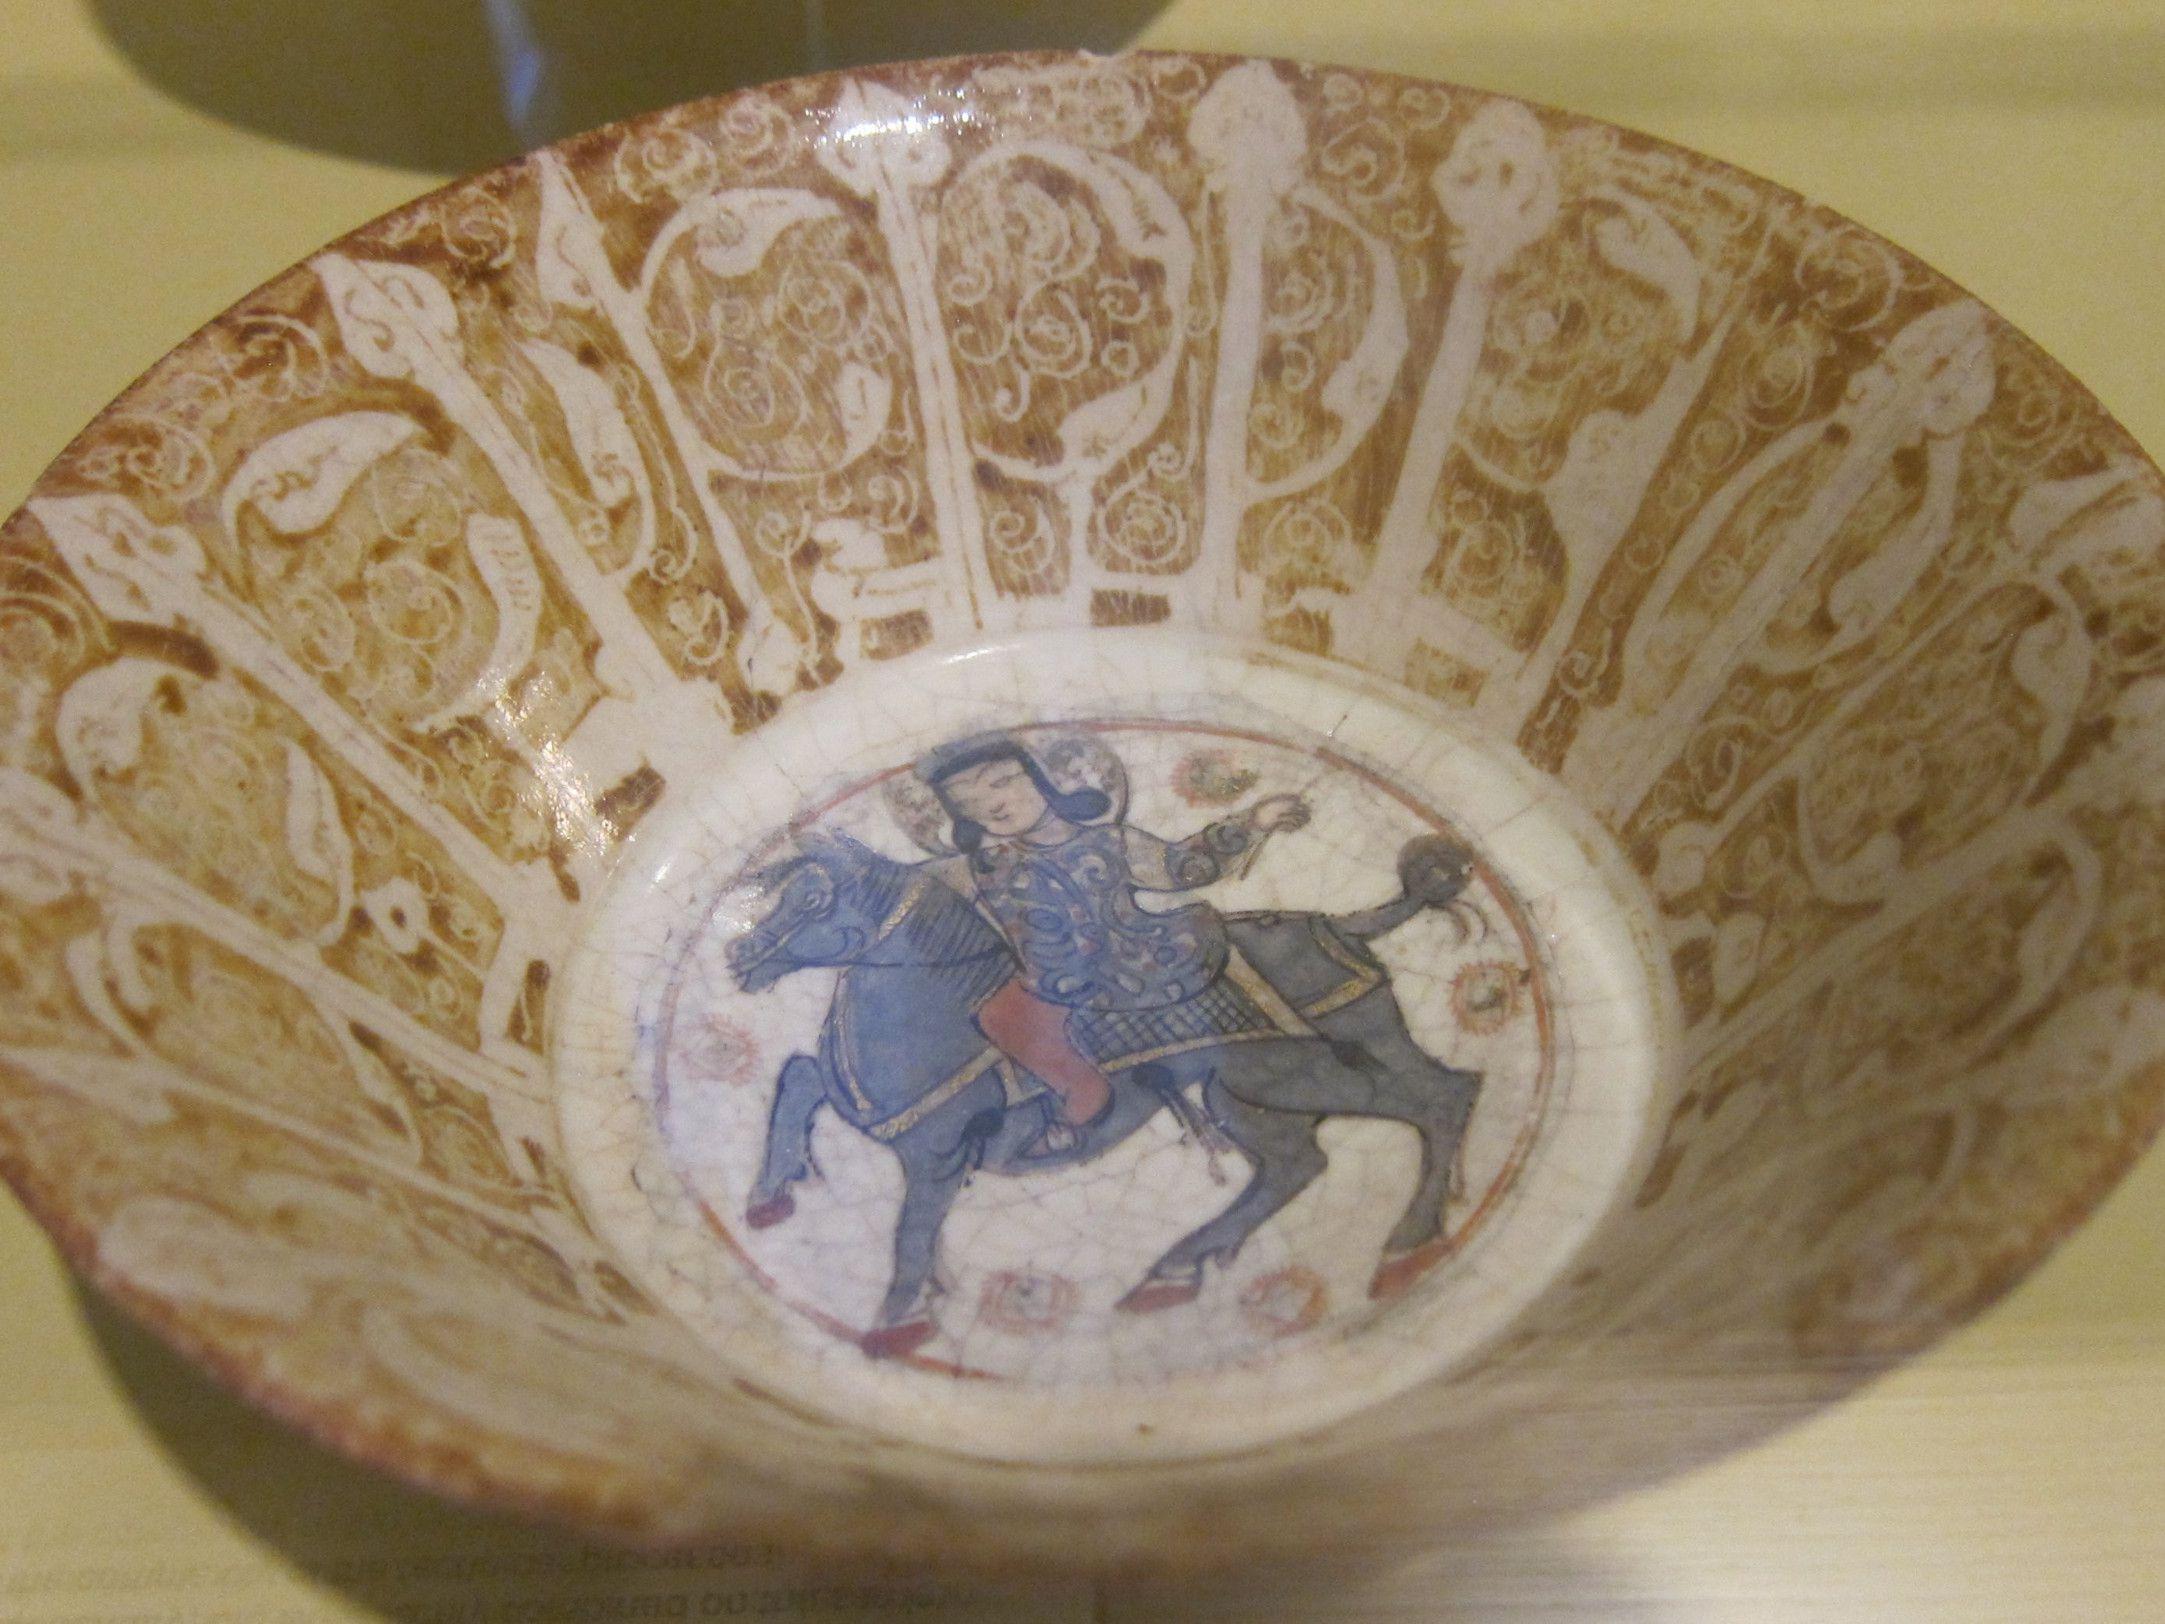 Lustreware - Medieval Islamic Pottery Technique